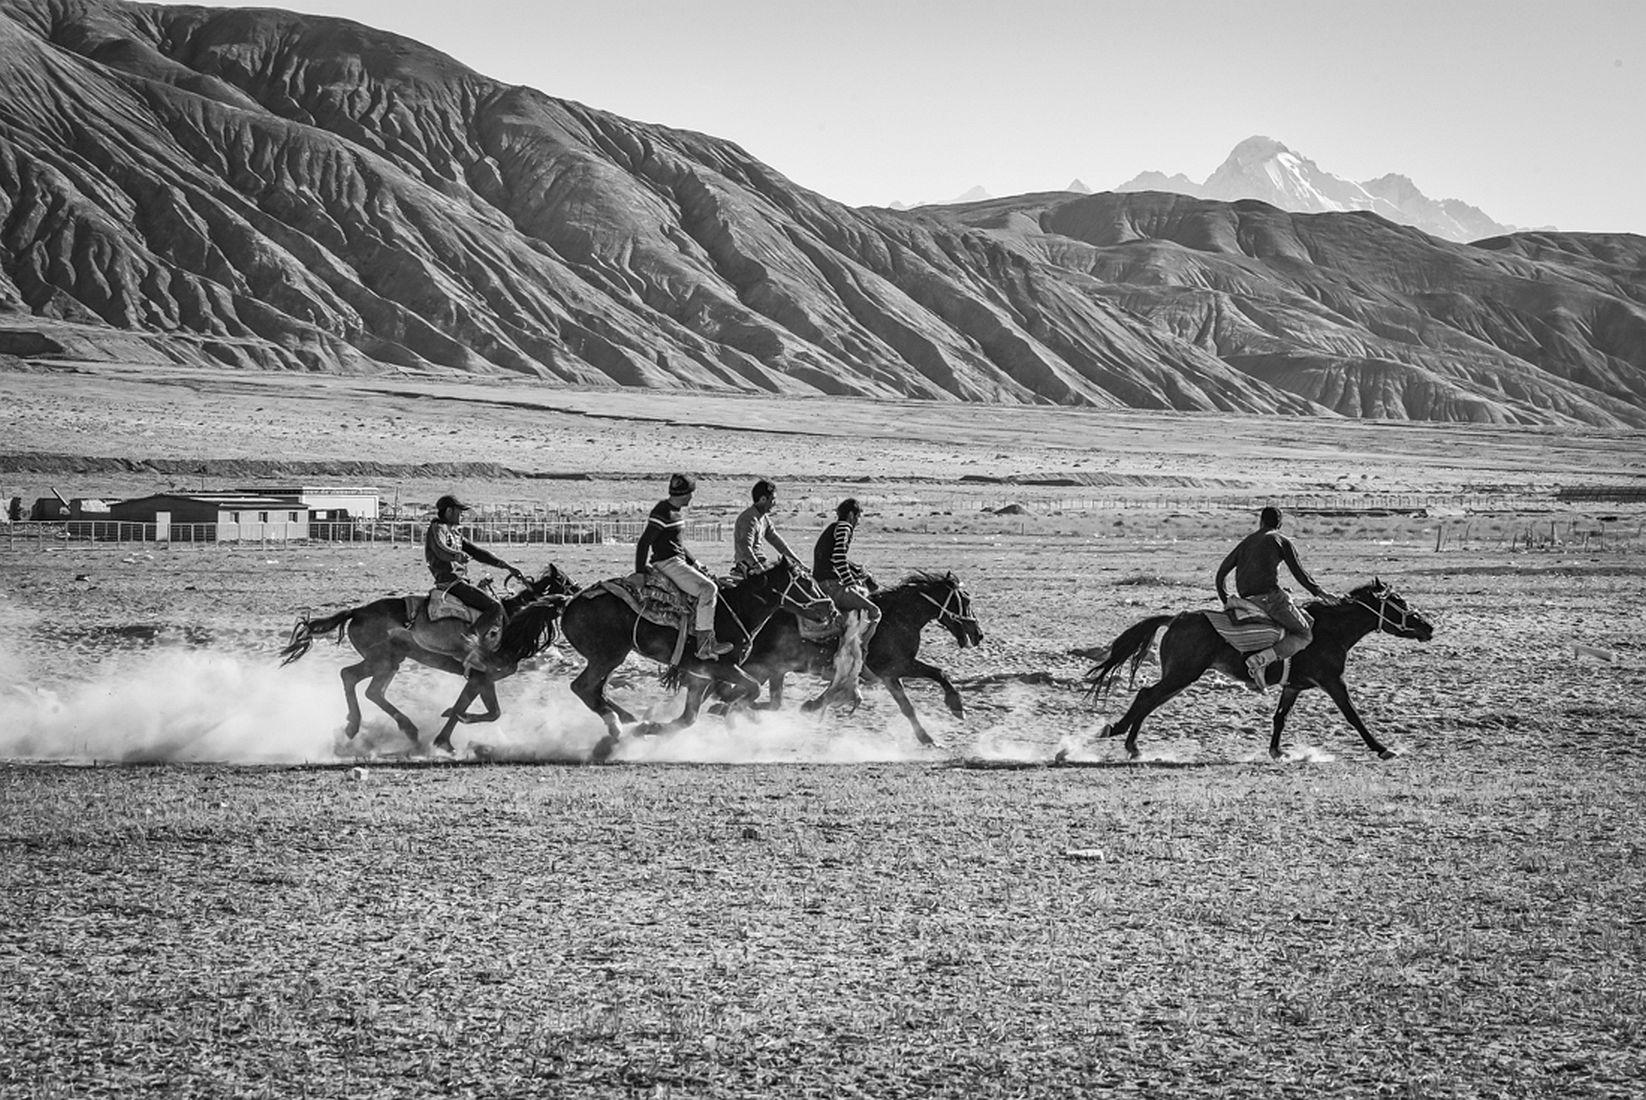 © John Eaton: A Game of Buzkashi / MonoVisions Photography Awards 2018 winner